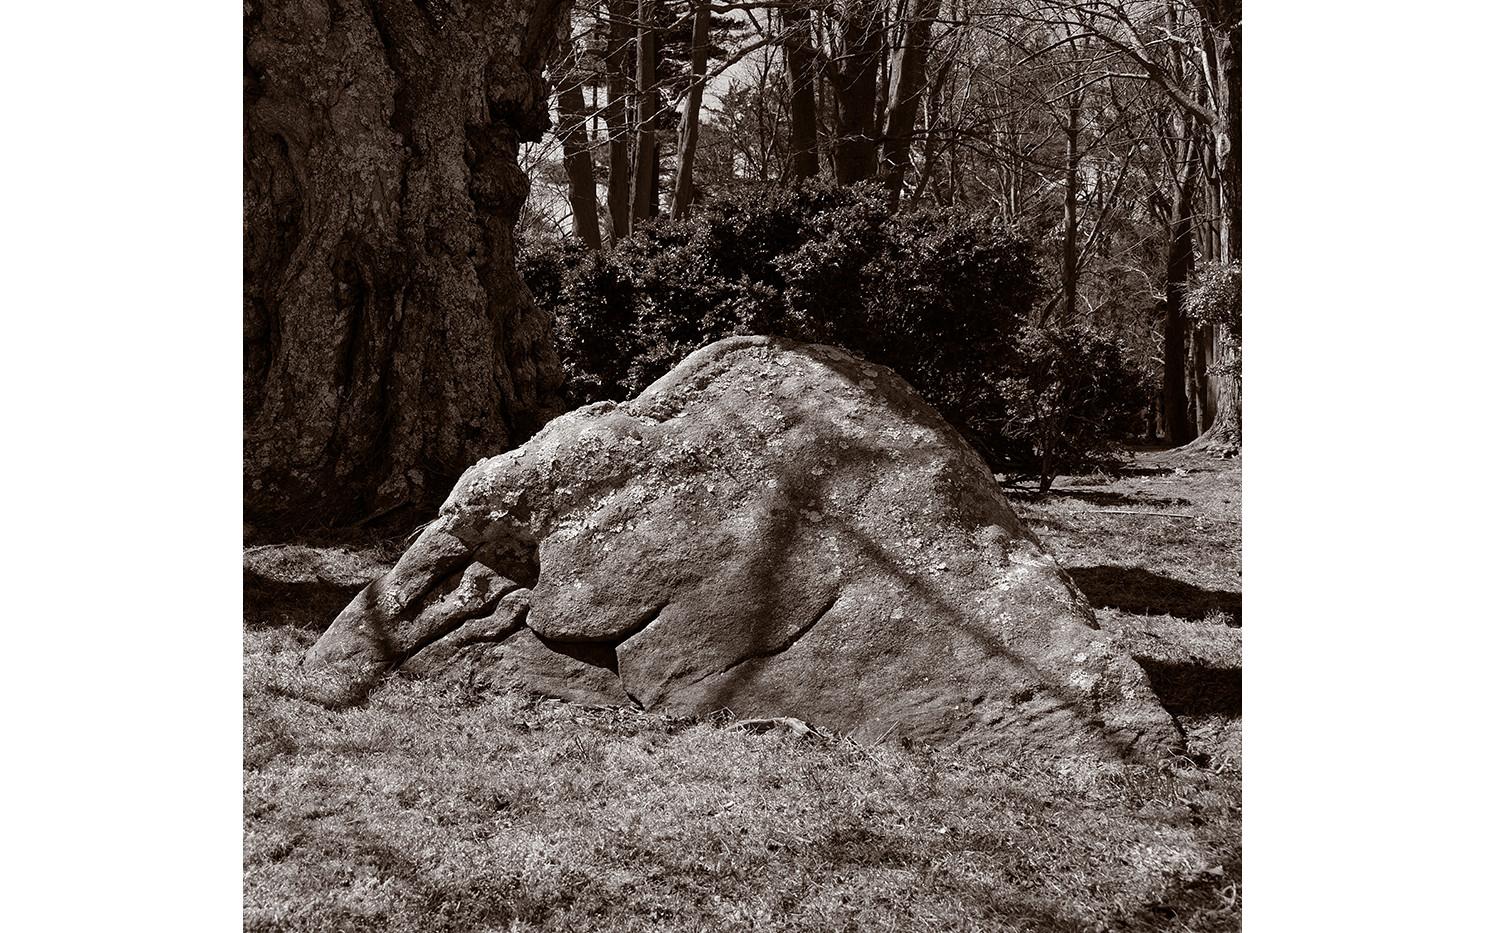 Massive stone